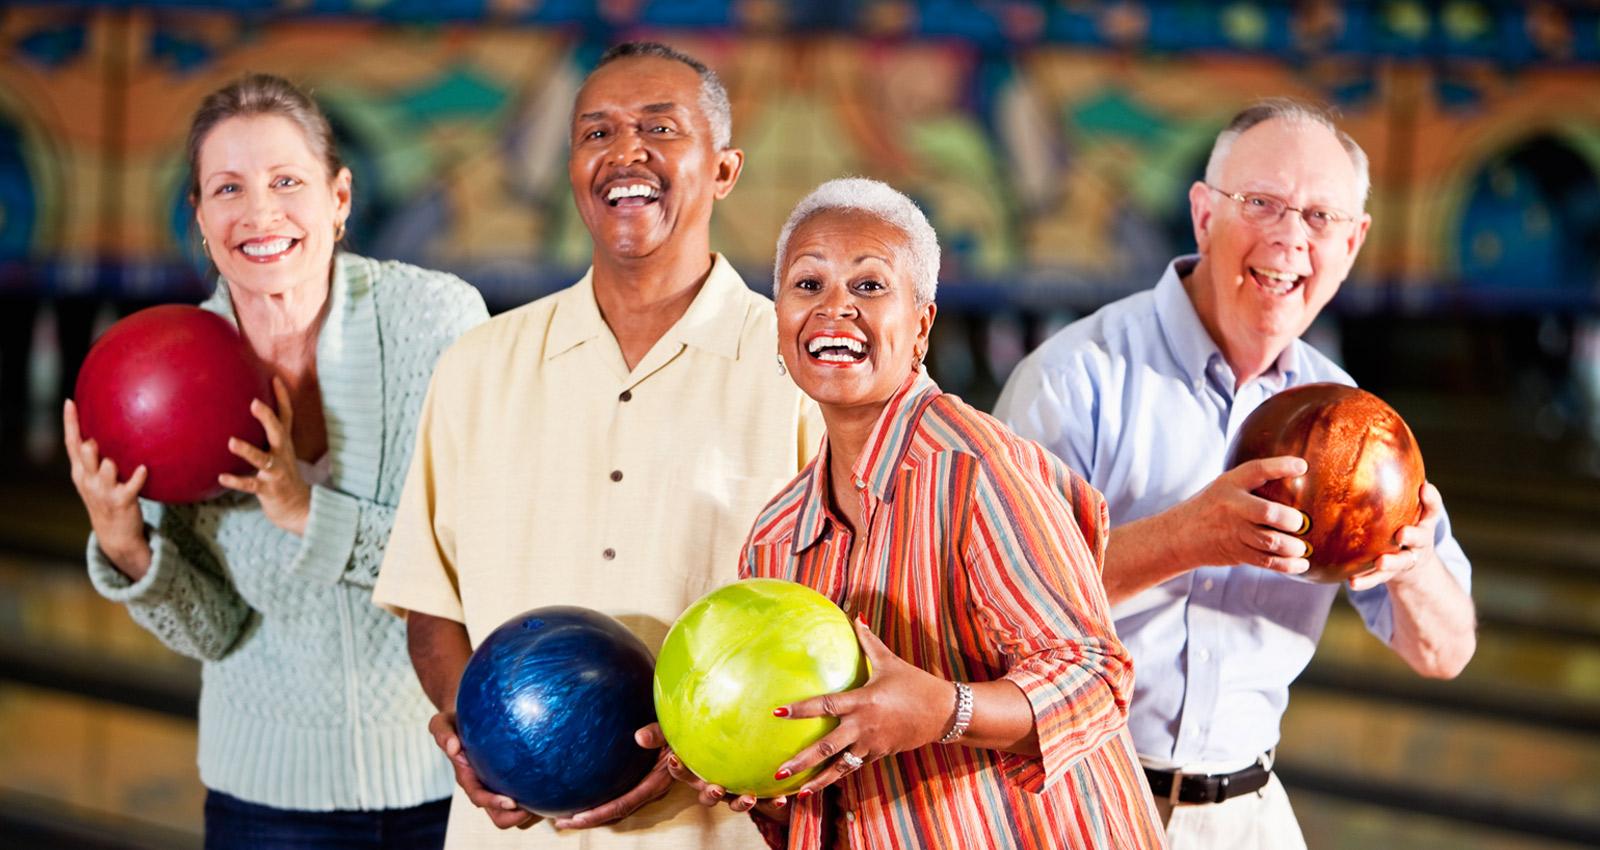 Older Couples Bowling at Princess Lanes in Caste Village